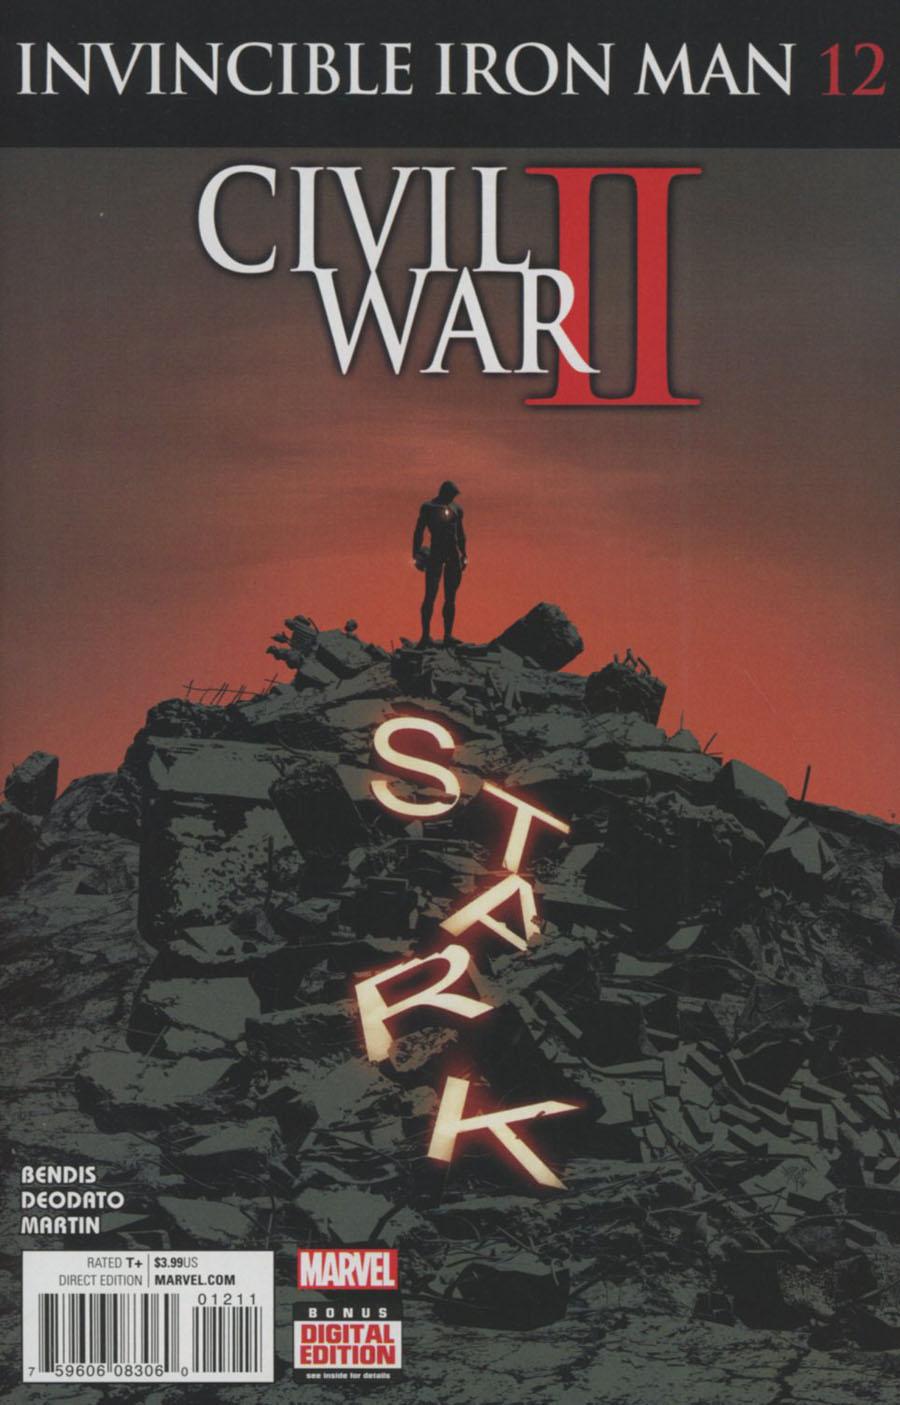 Invincible Iron Man Vol 2 #12 Cover A Regular Mike Deodato Jr Cover (Civil War II Tie-In)